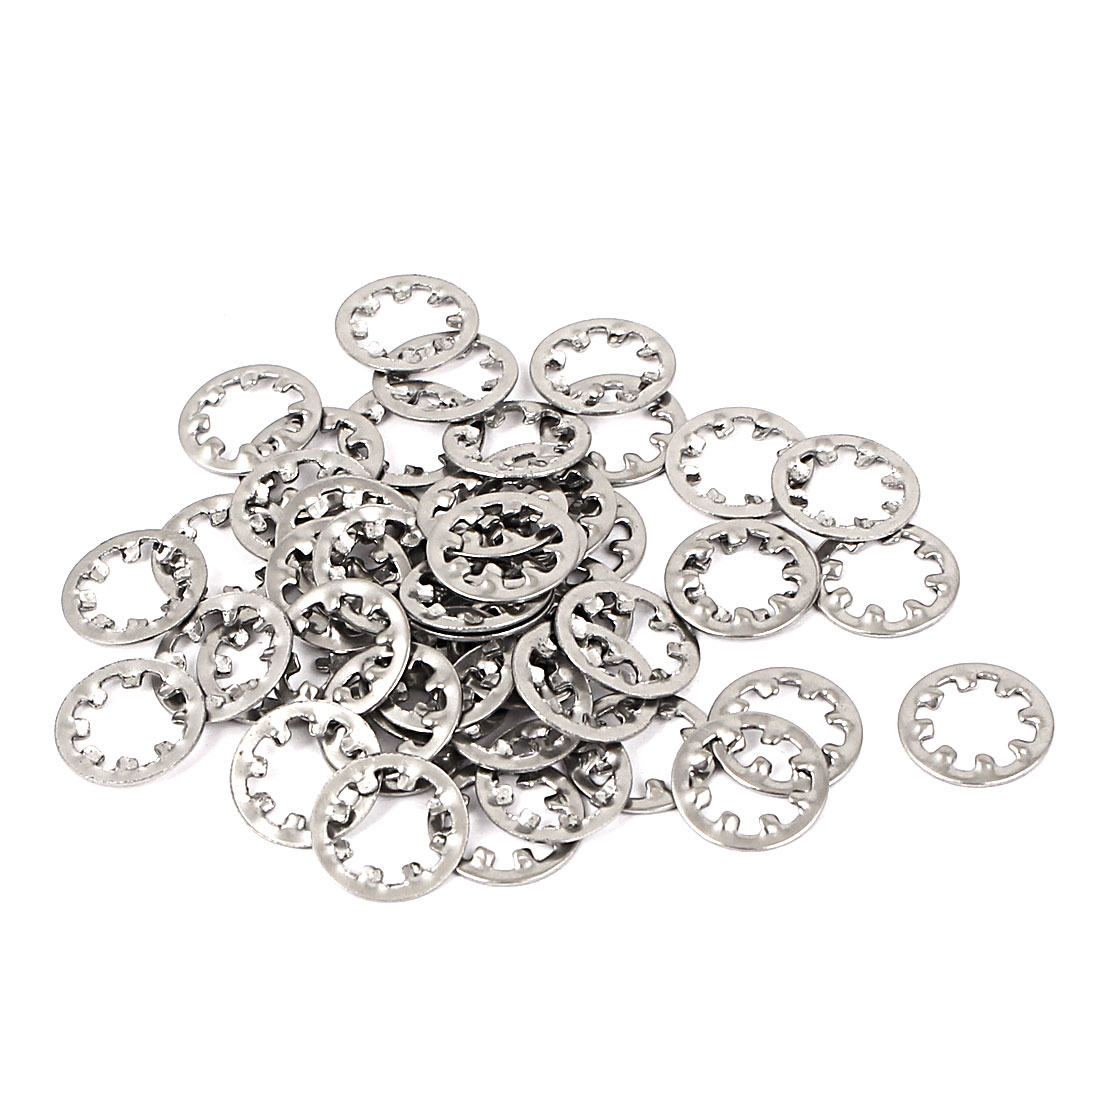 M6 304 Stainless Steel Internal Star Lock Washers 50 Pcs